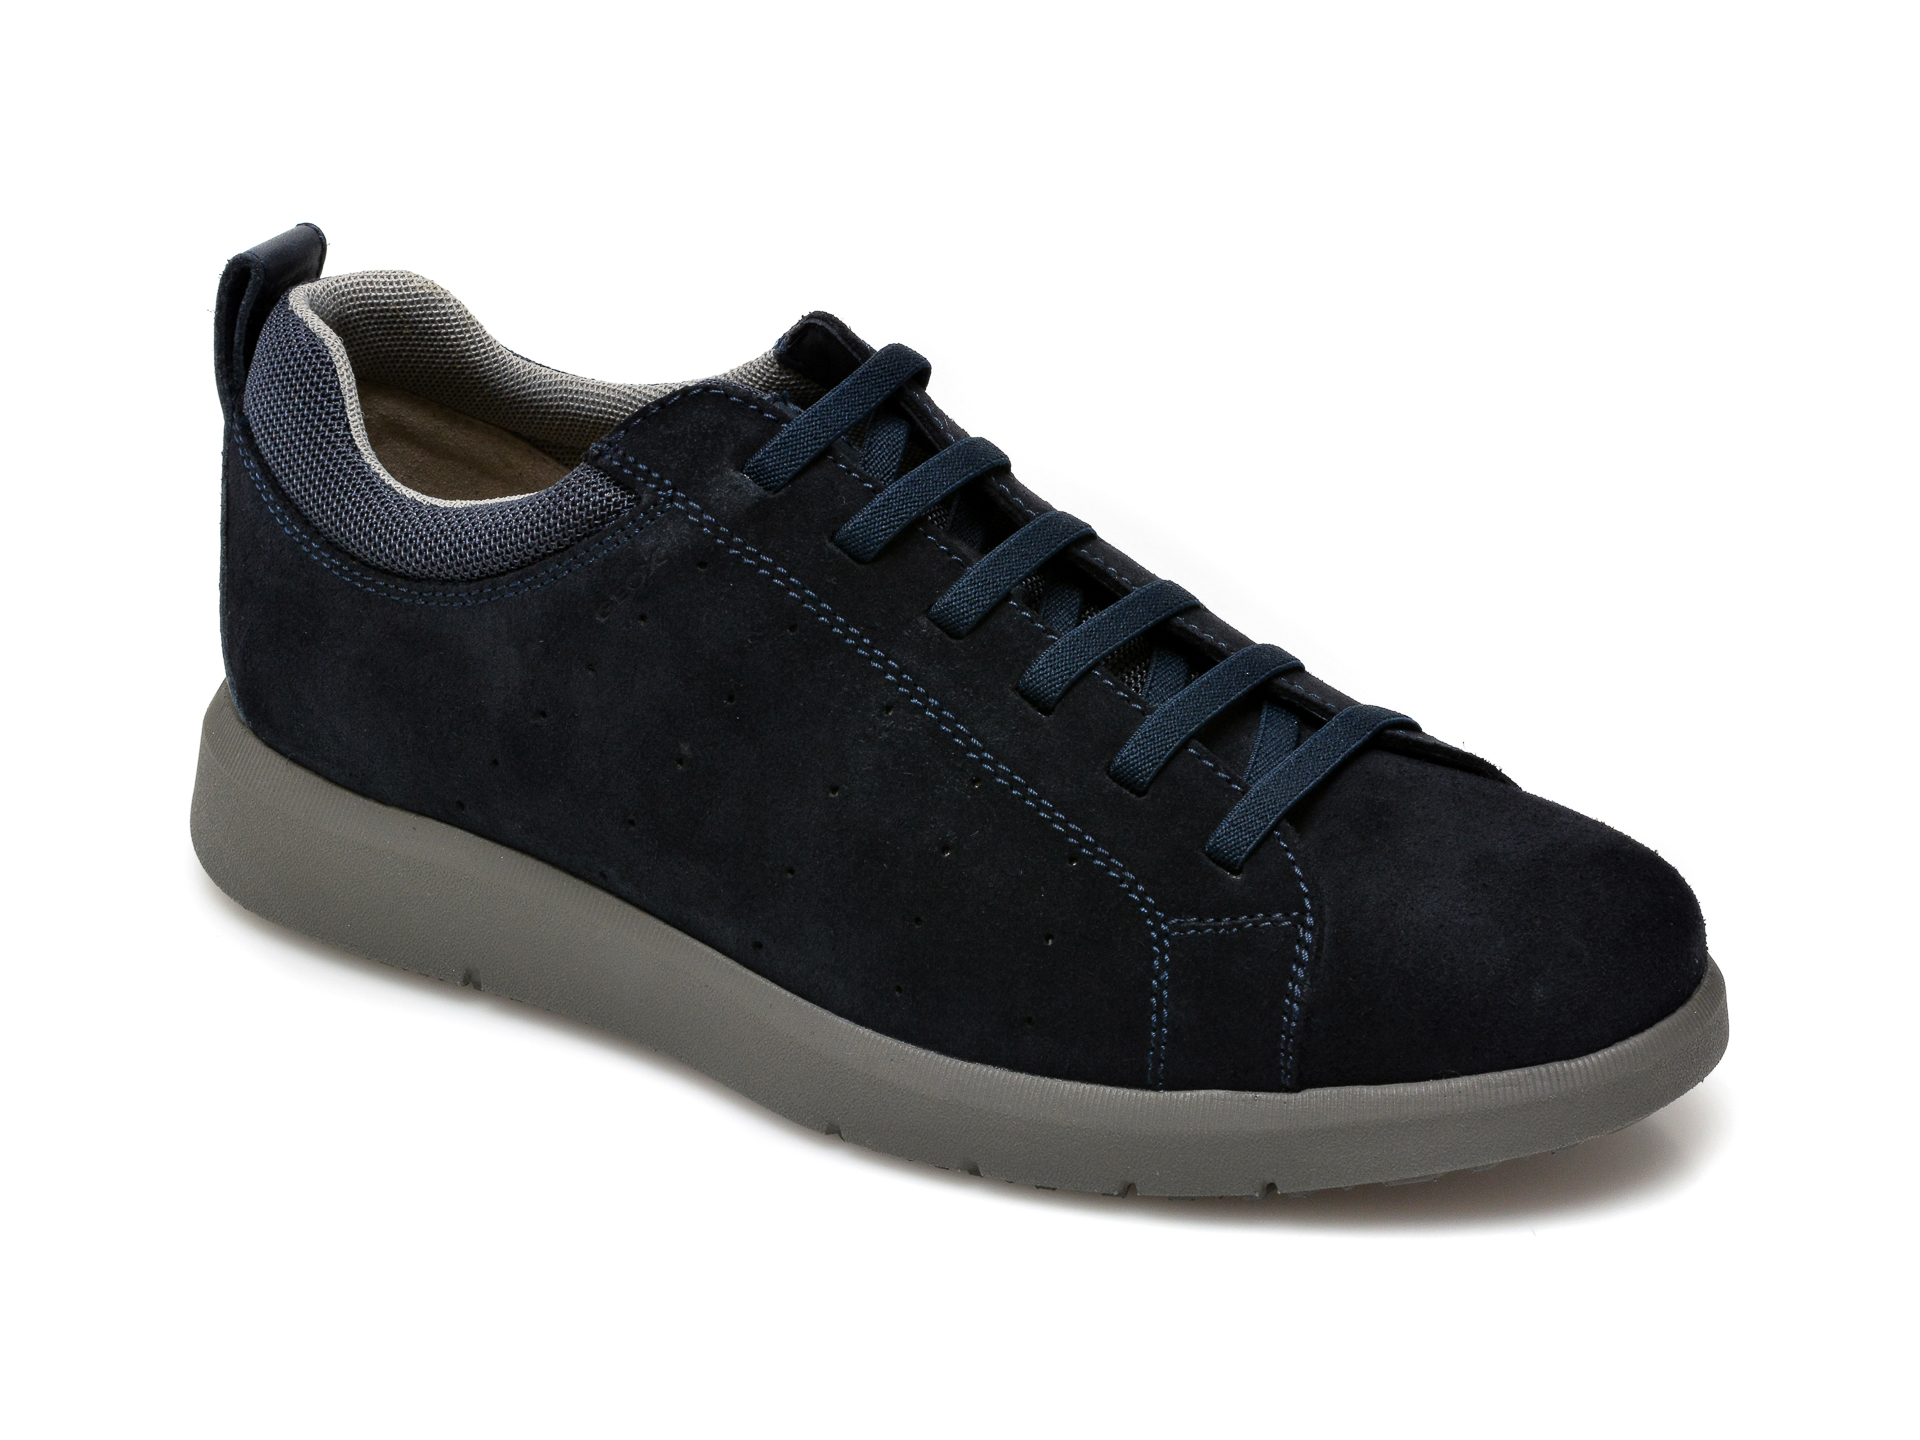 Pantofi GEOX bleumarin, U15AYC, din piele intoarsa New